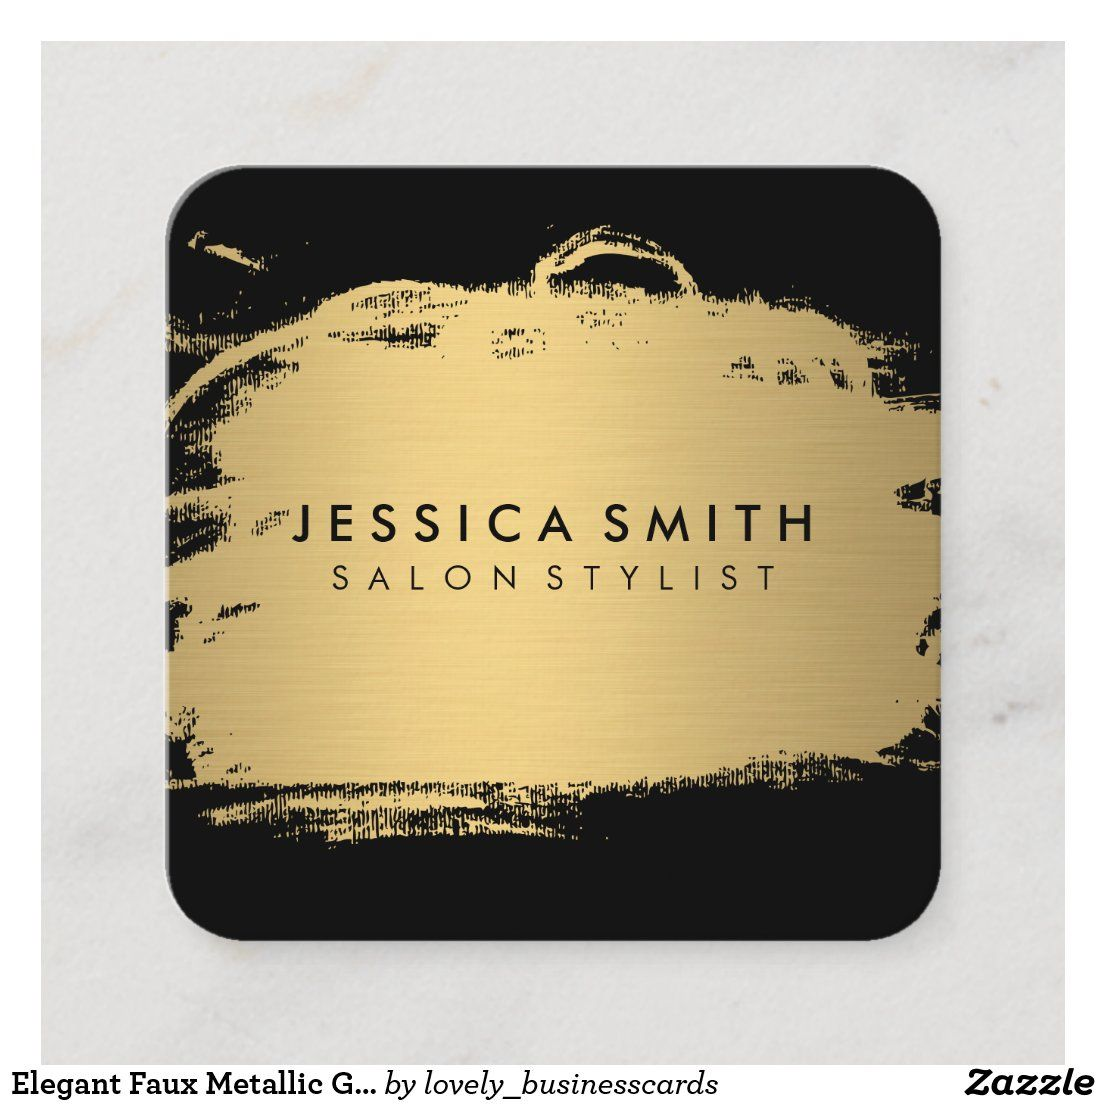 Elegant Faux Metallic Gold And Black Square Business Card Zazzle Com In 2021 Square Business Card Trendy Business Cards Metallic Gold And Black